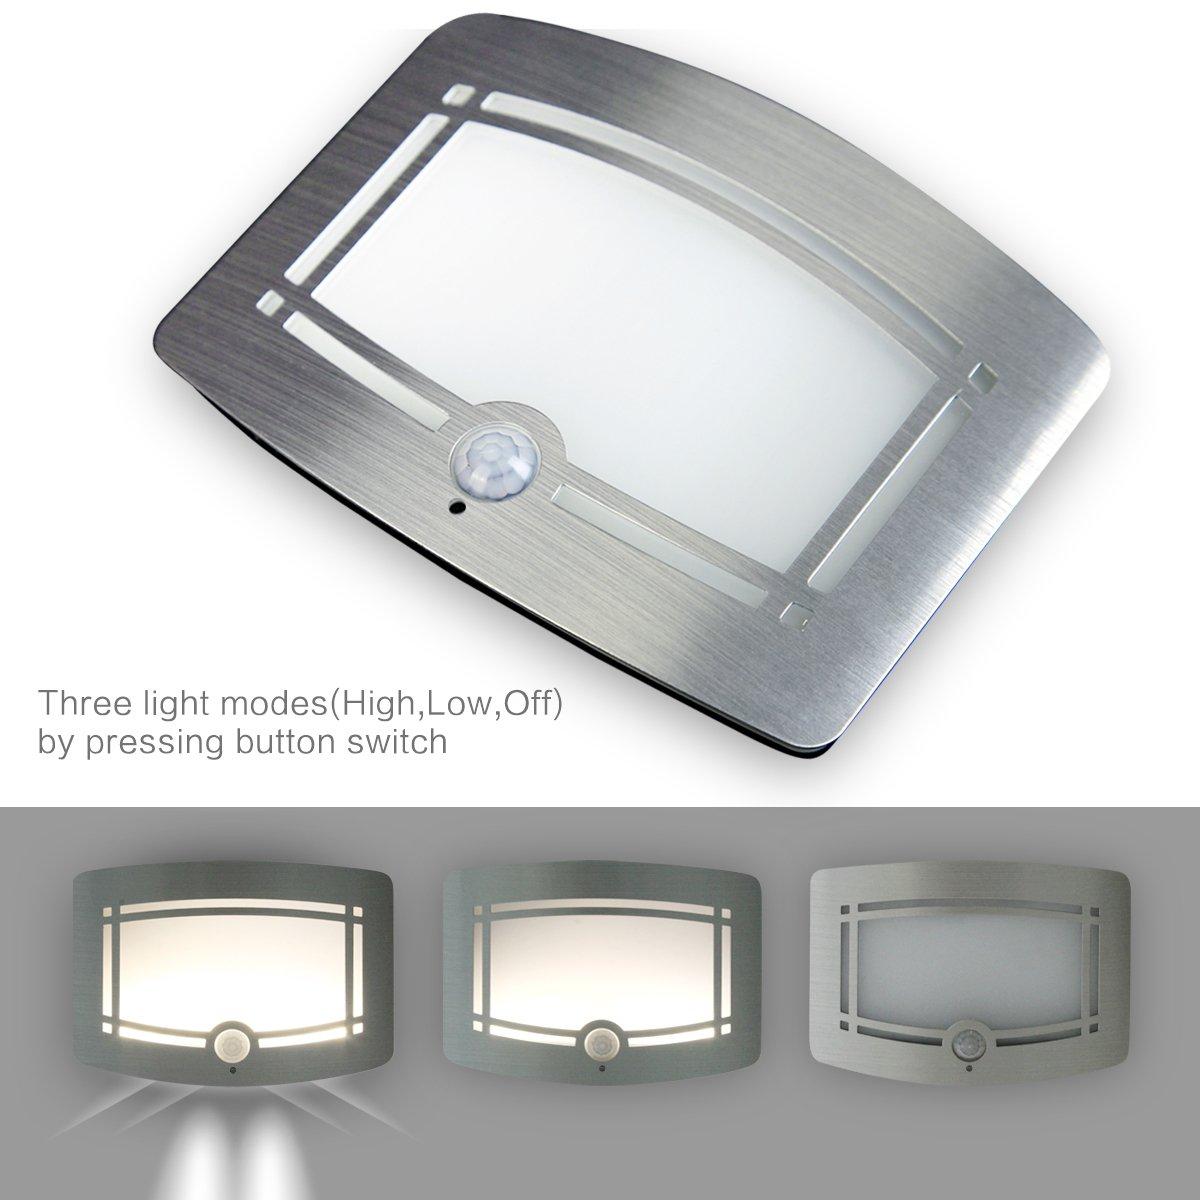 Motion Sensor LED Night Light,Wireless Battery Powered Wall Lamp,Stick Anywhere Wall Sconce,Aluminum Case Closet Light,Safe Light for Stair, Hallway,Bathrom,Bedroom,Kitchen by Kalefu (Image #5)